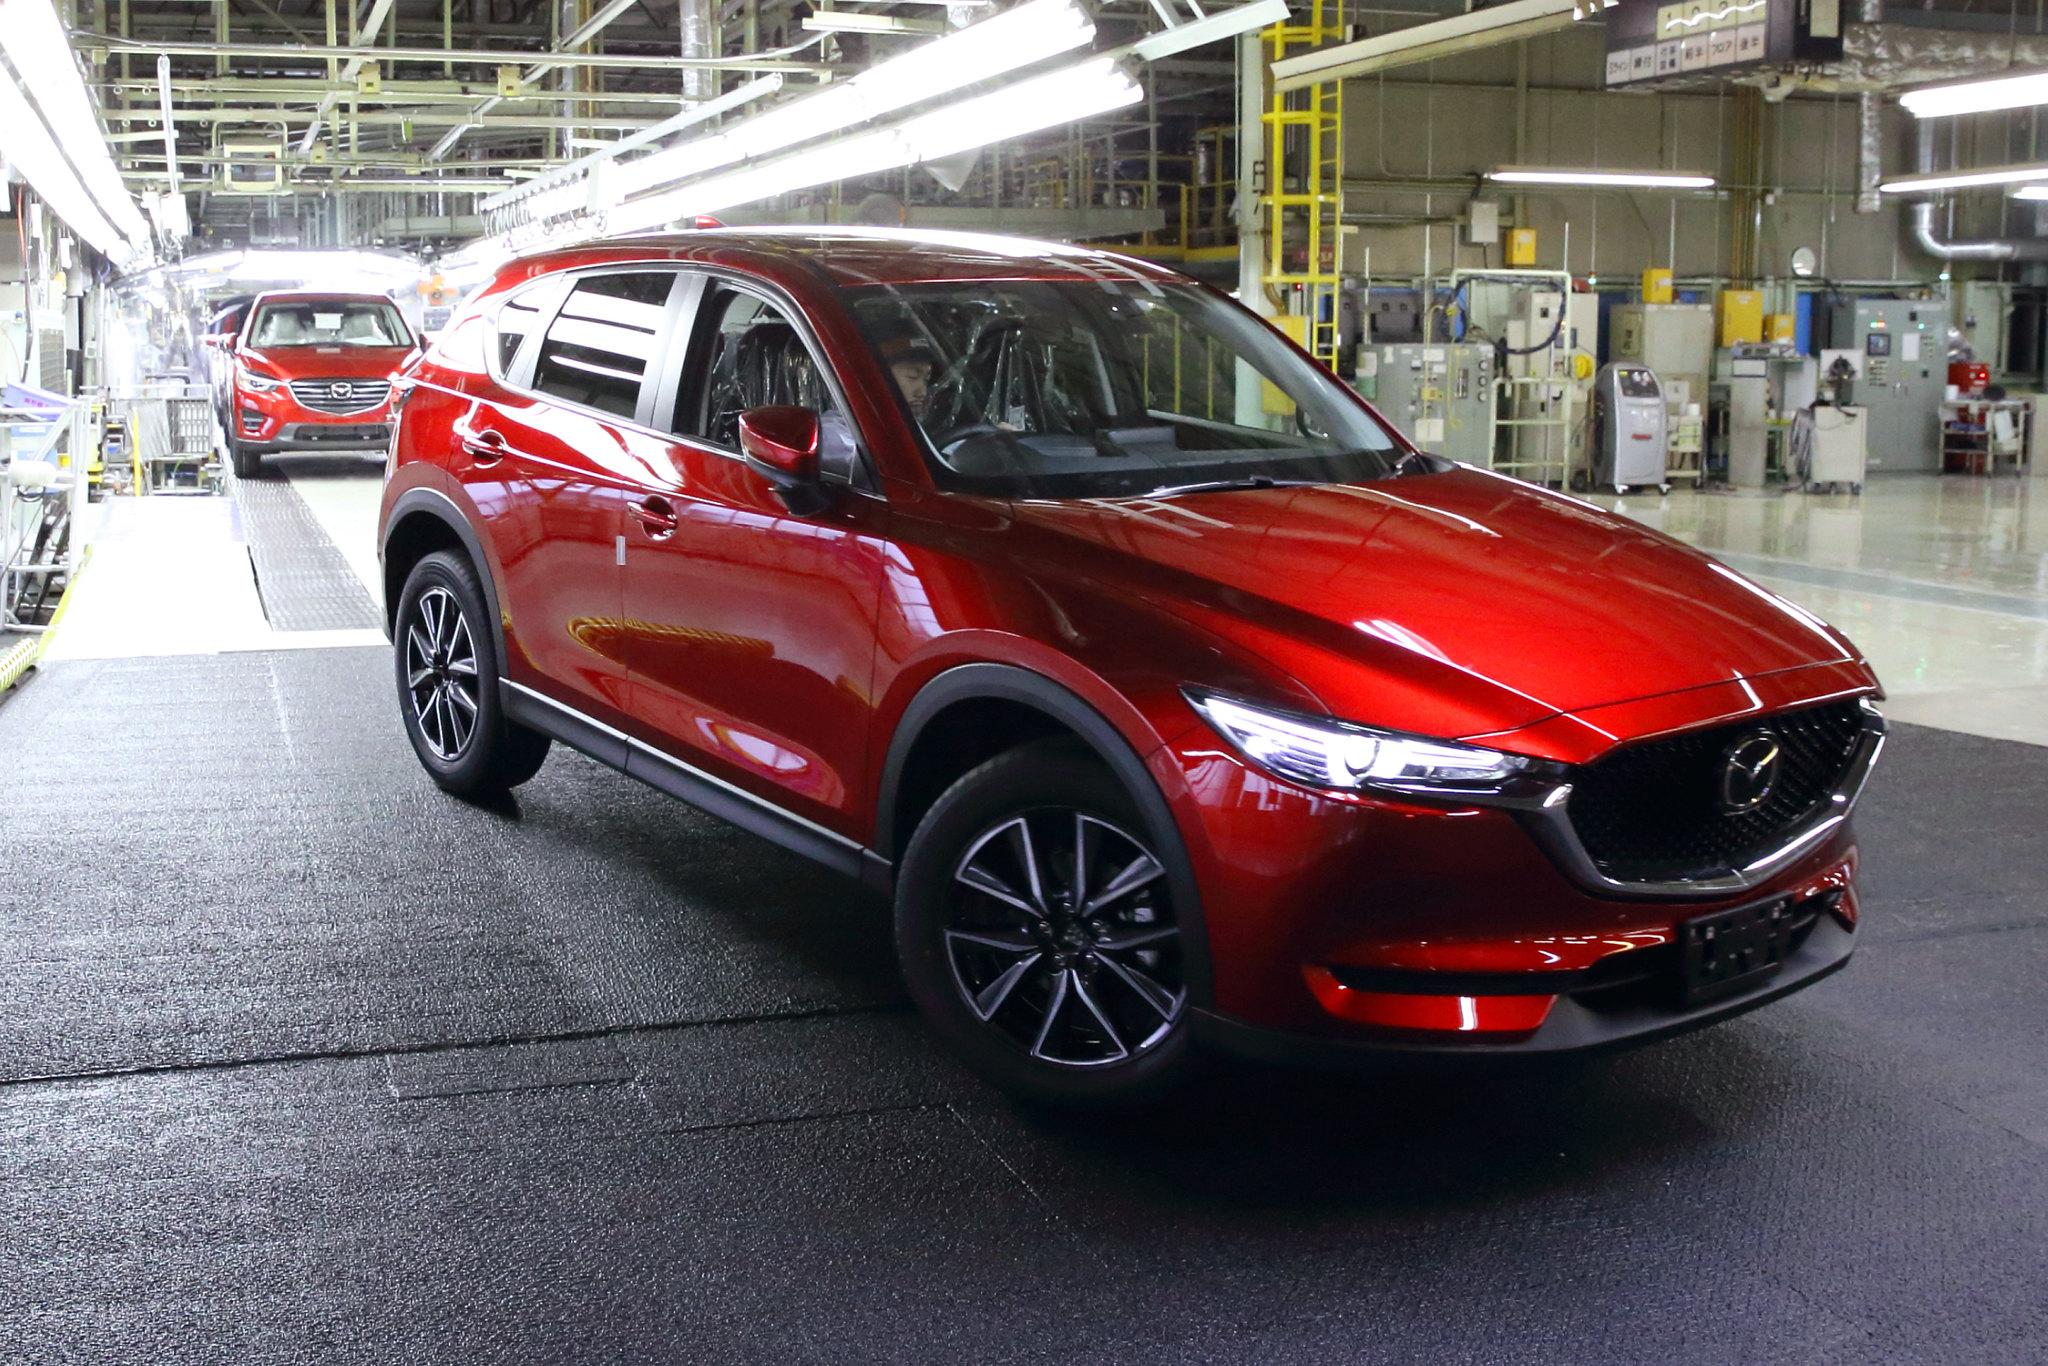 Mazda starts production of 2017 CX-5